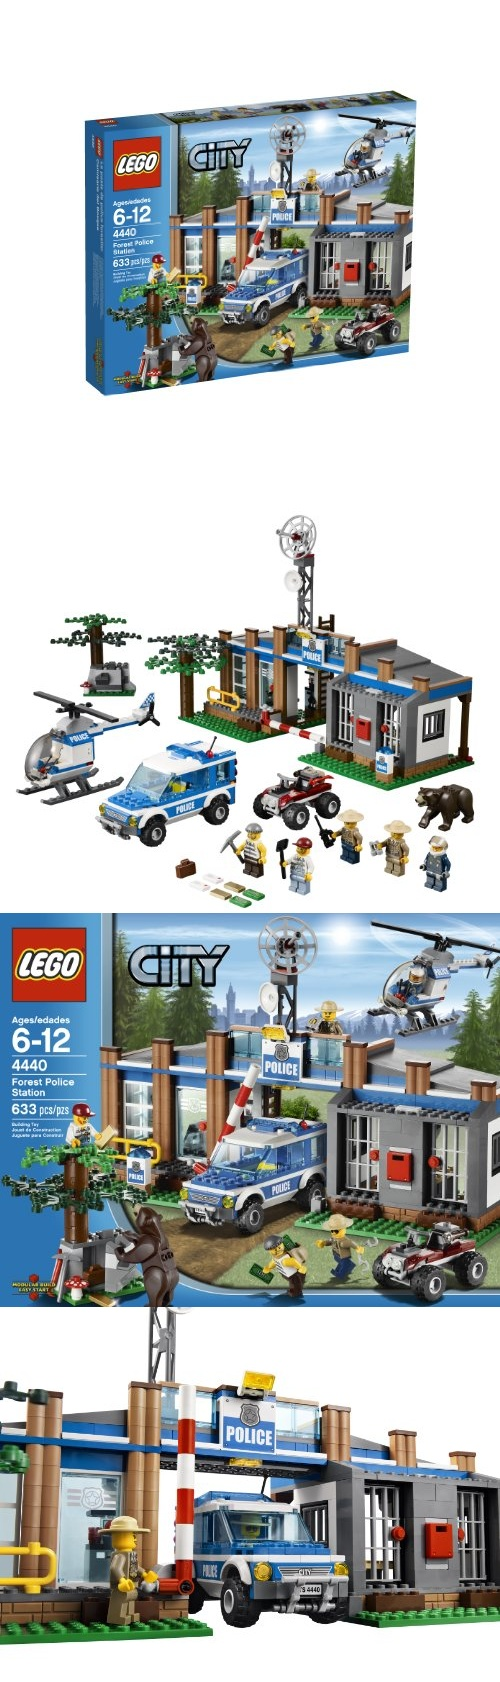 LEGO City Police Forest Station 4440 - Building Sets - Toys$51.99